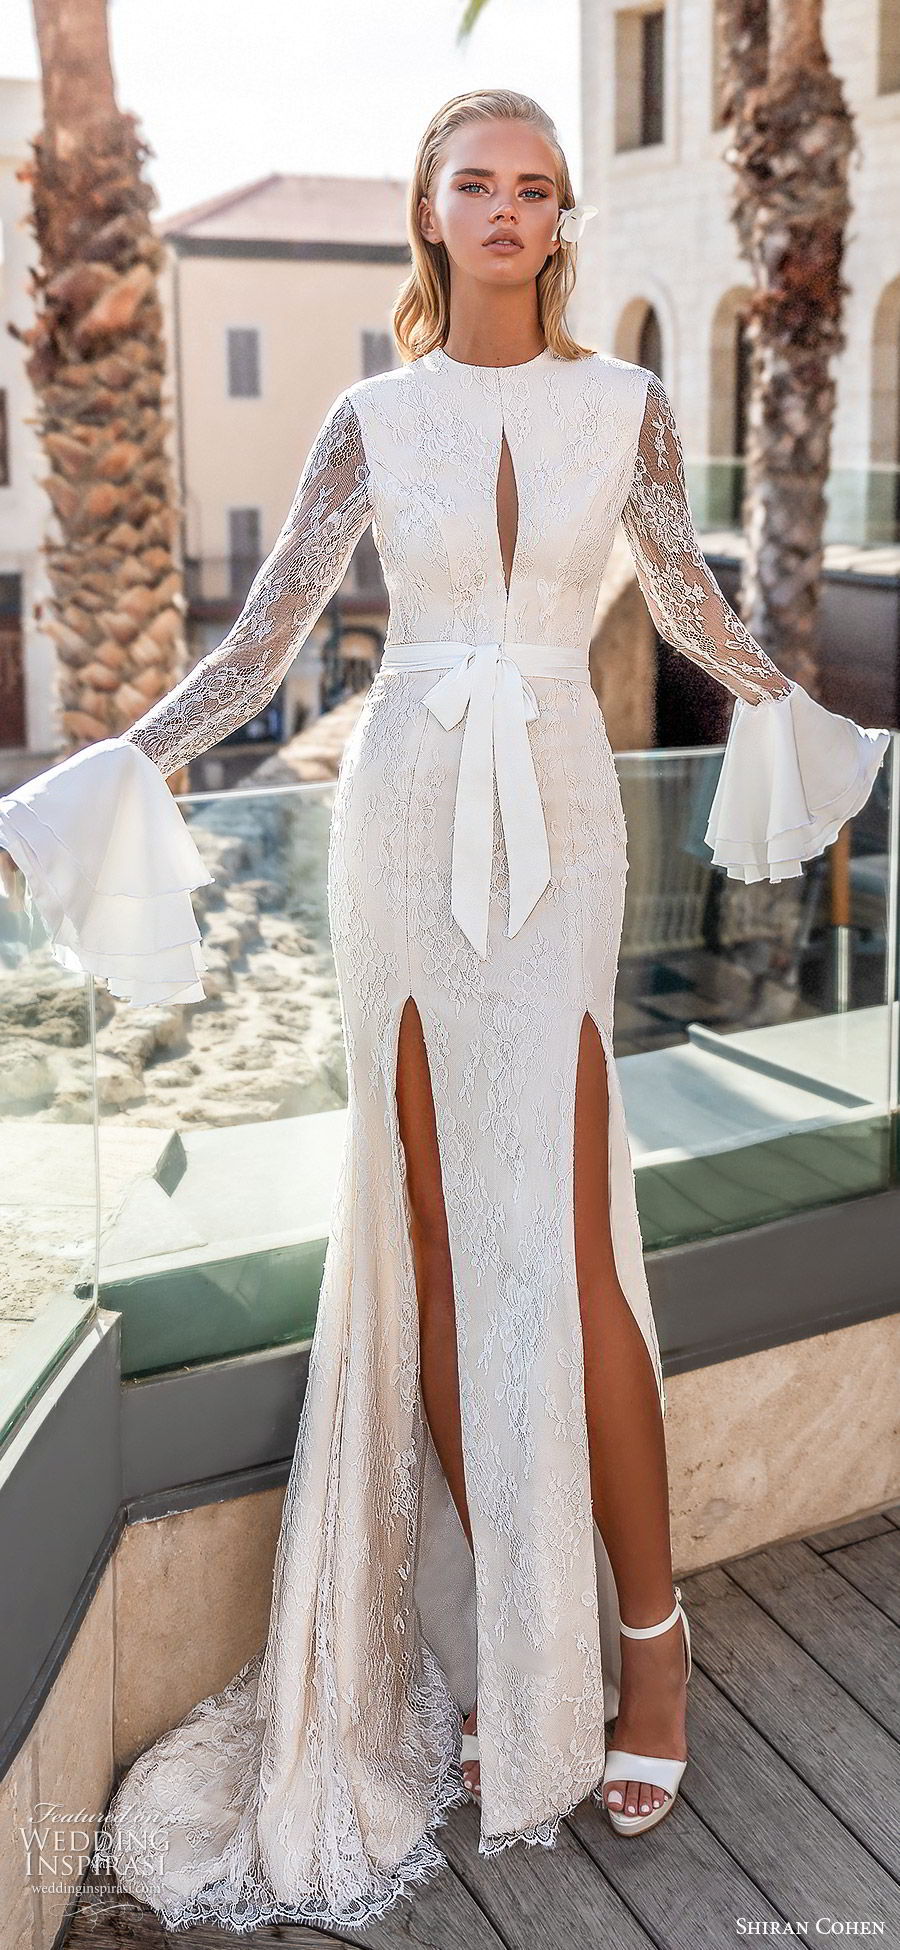 shiran cohen 2019 bridal long bell sleeves high neckline cutout bodice lace sheath trumpet wedding dress slit skirt sexy modern (3) lv